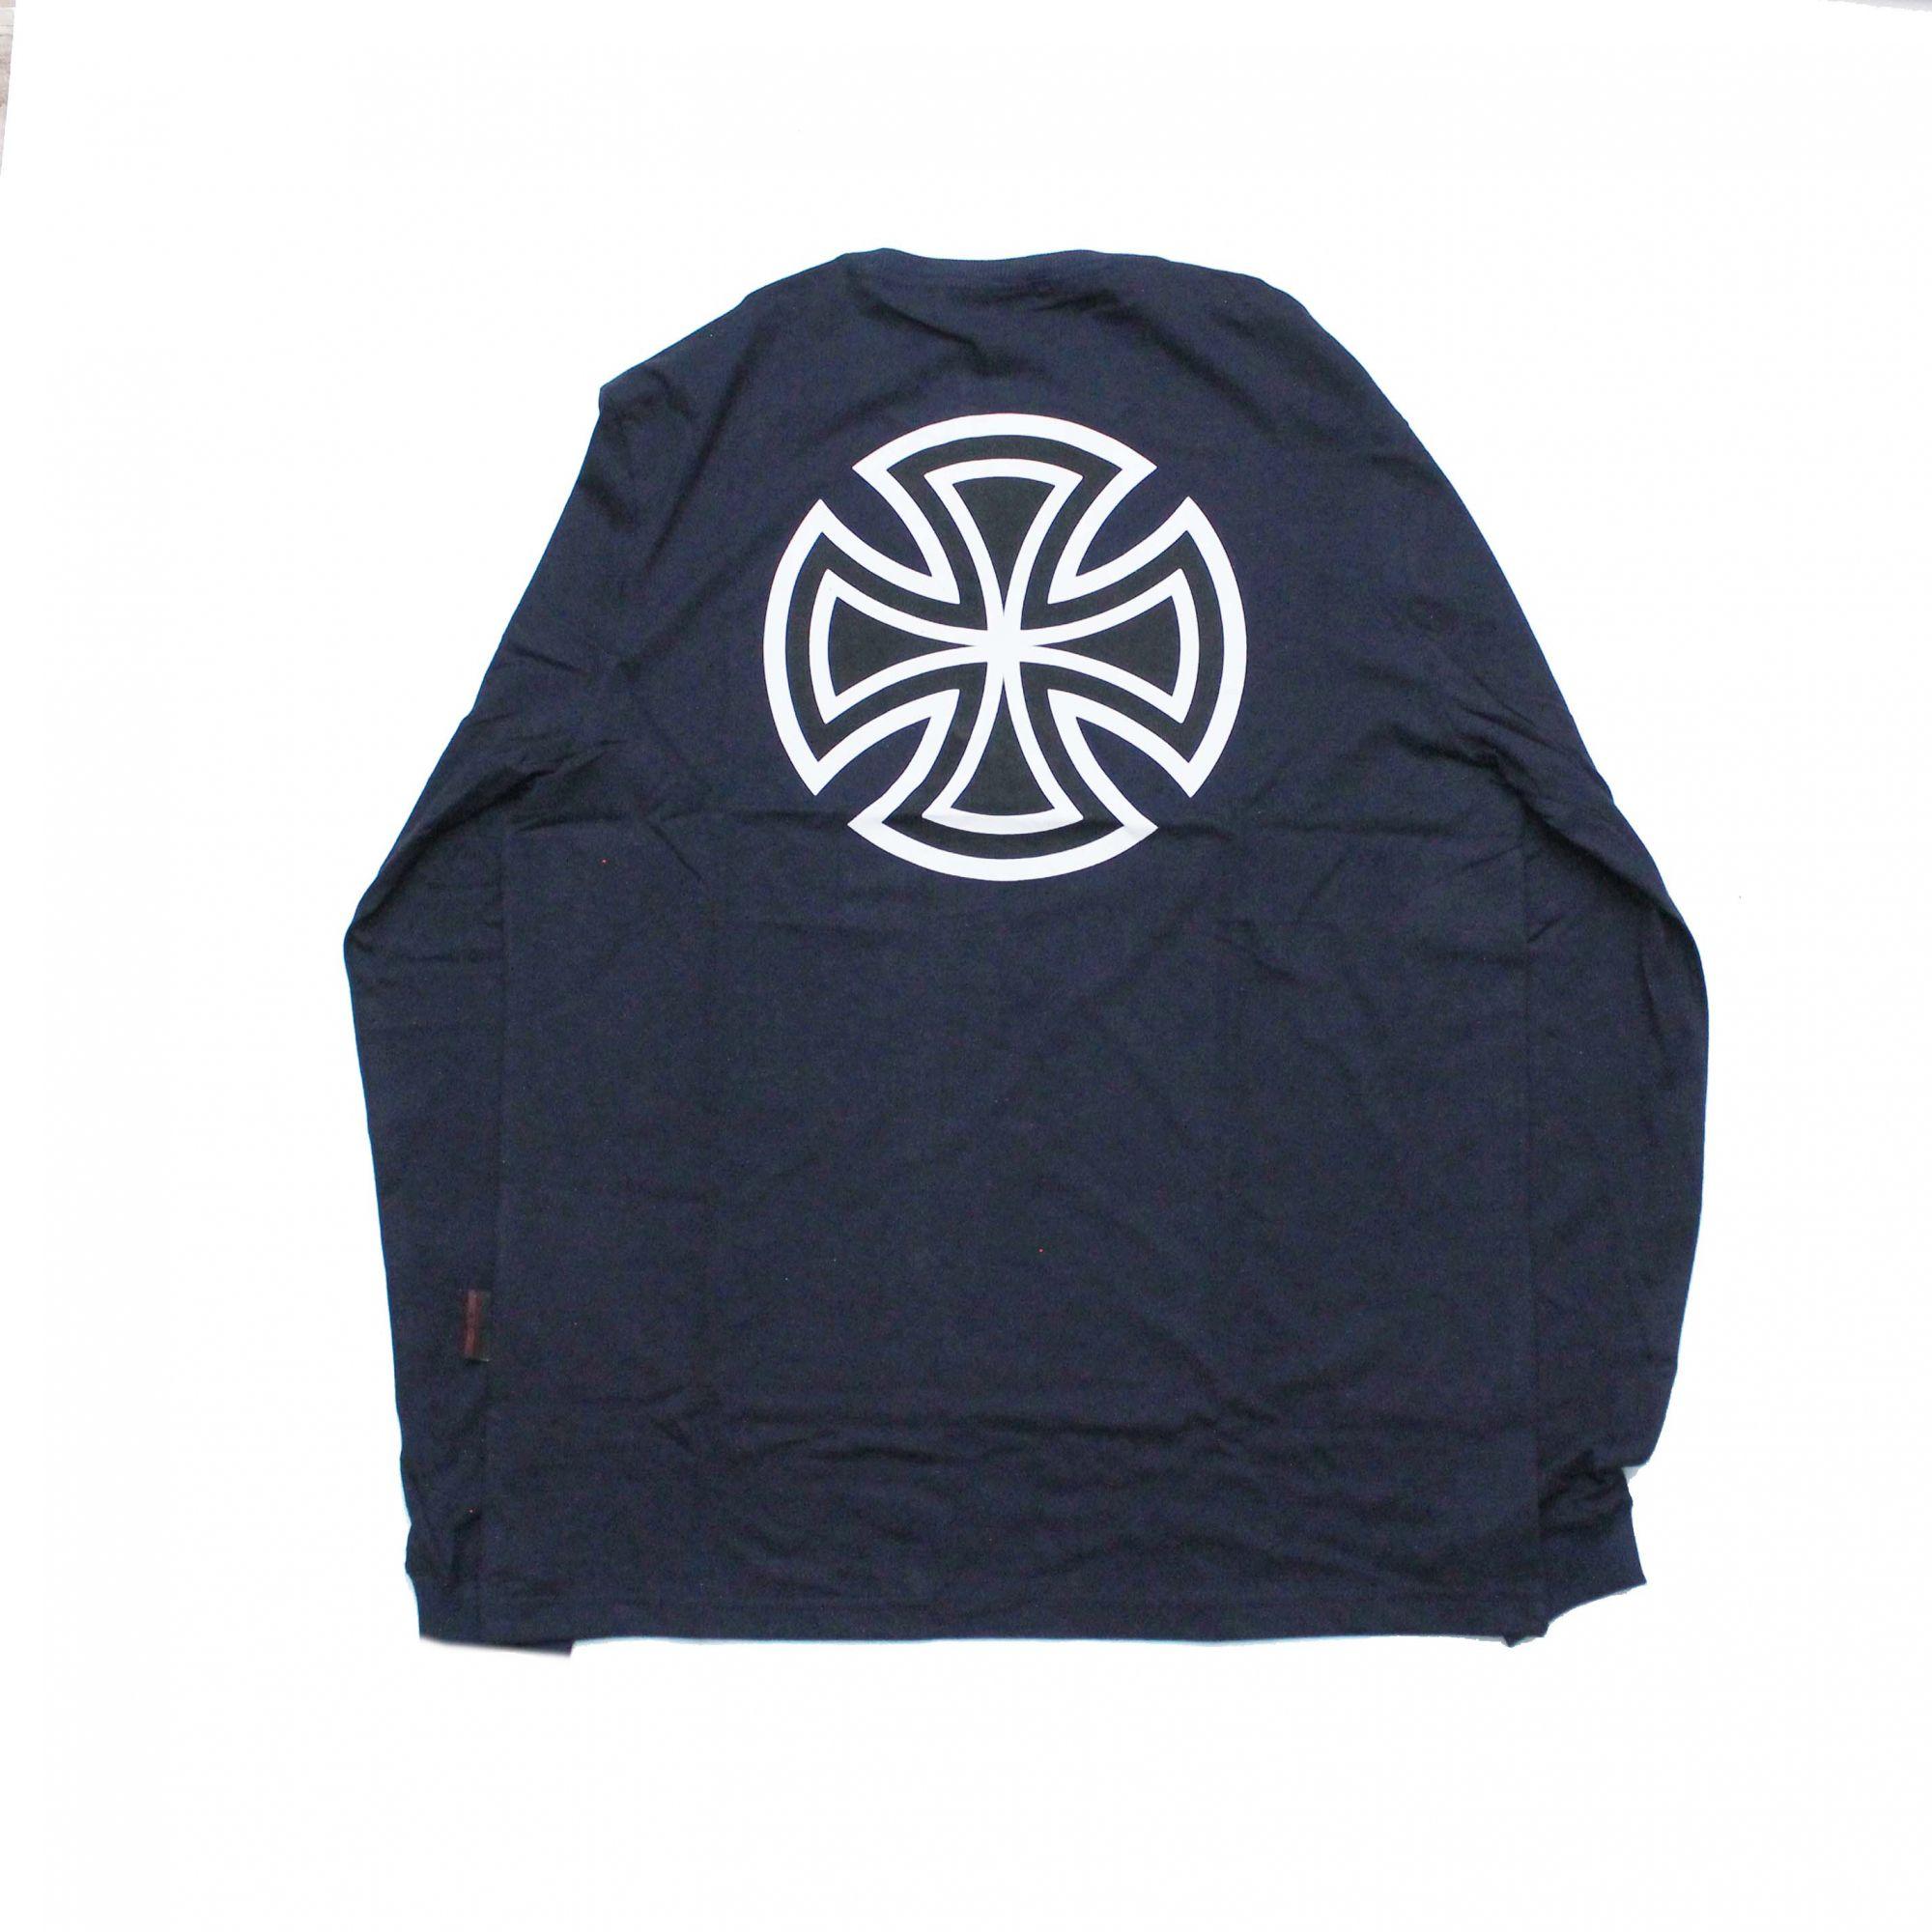 Camiseta Manga Longa Independent Black Bar Cross Azul Marinho